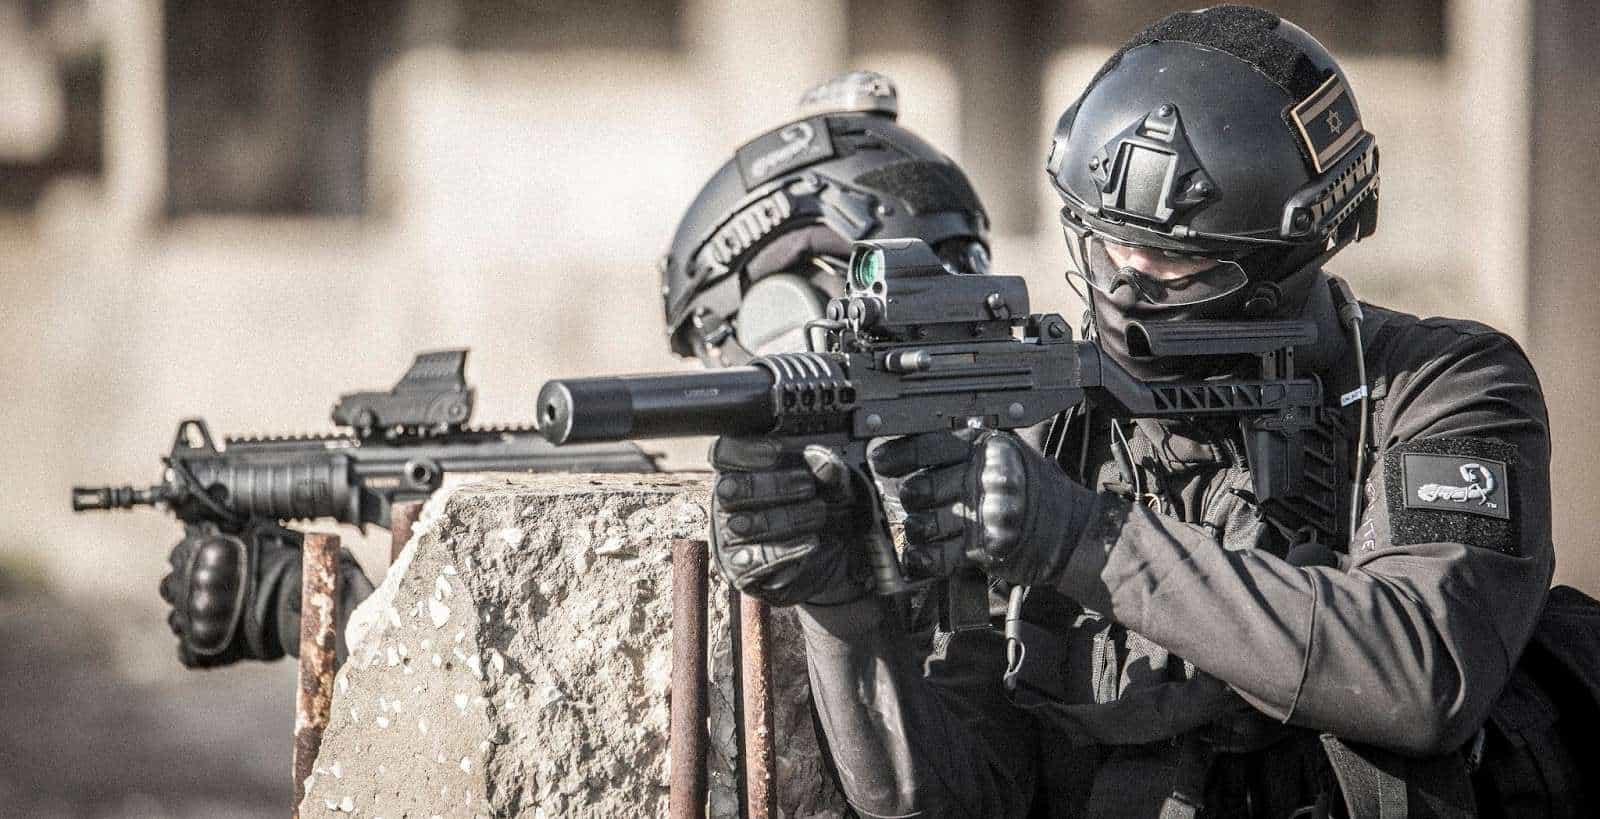 UZI: Η ιστορία πίσω από τo όπλο – σύμβολο του Ισραήλ που «λατρεύεται» μέχρι και σήμερα [pics]